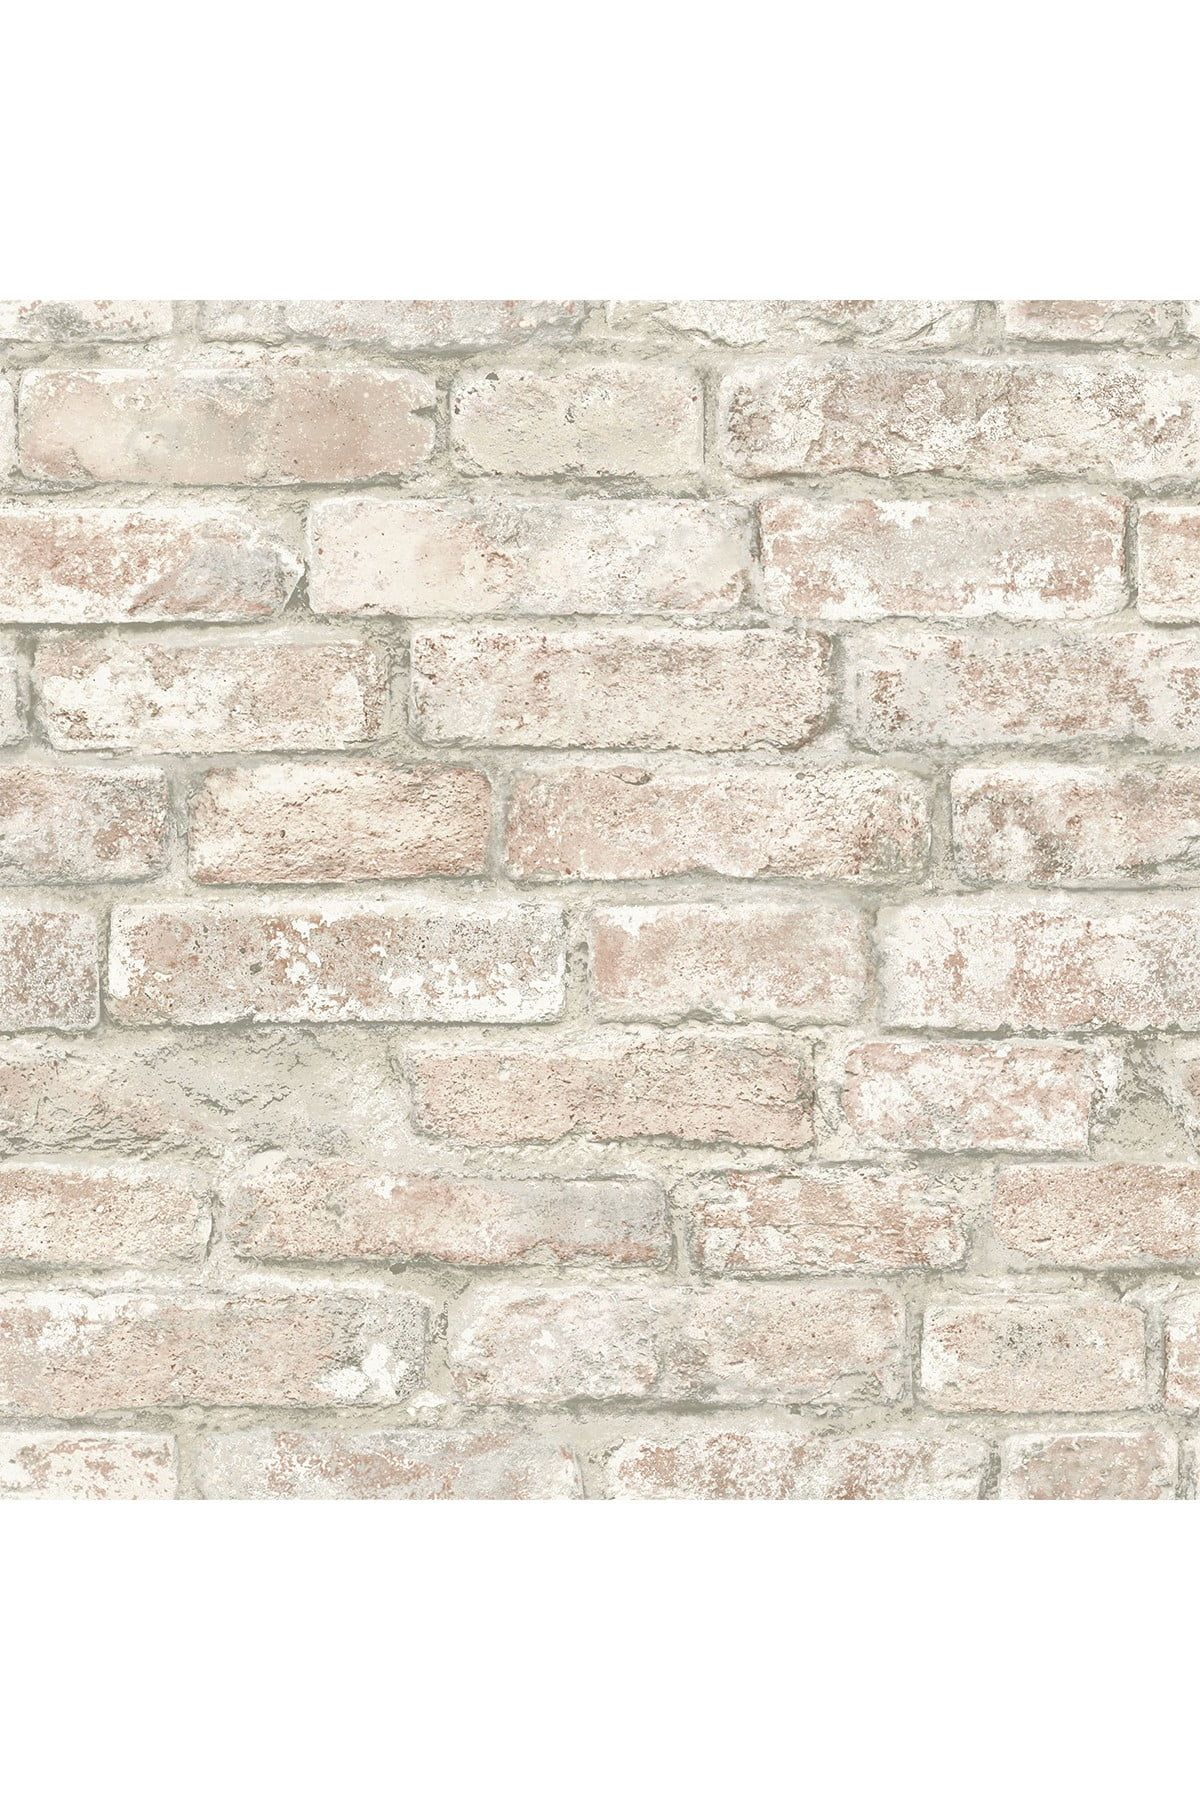 Wallpops White Washed Denver Brick Peel Stick Wallpaper Nordstrom Rack In 2021 Painted Brick Backsplash White Wash Brick Painted Brick Walls